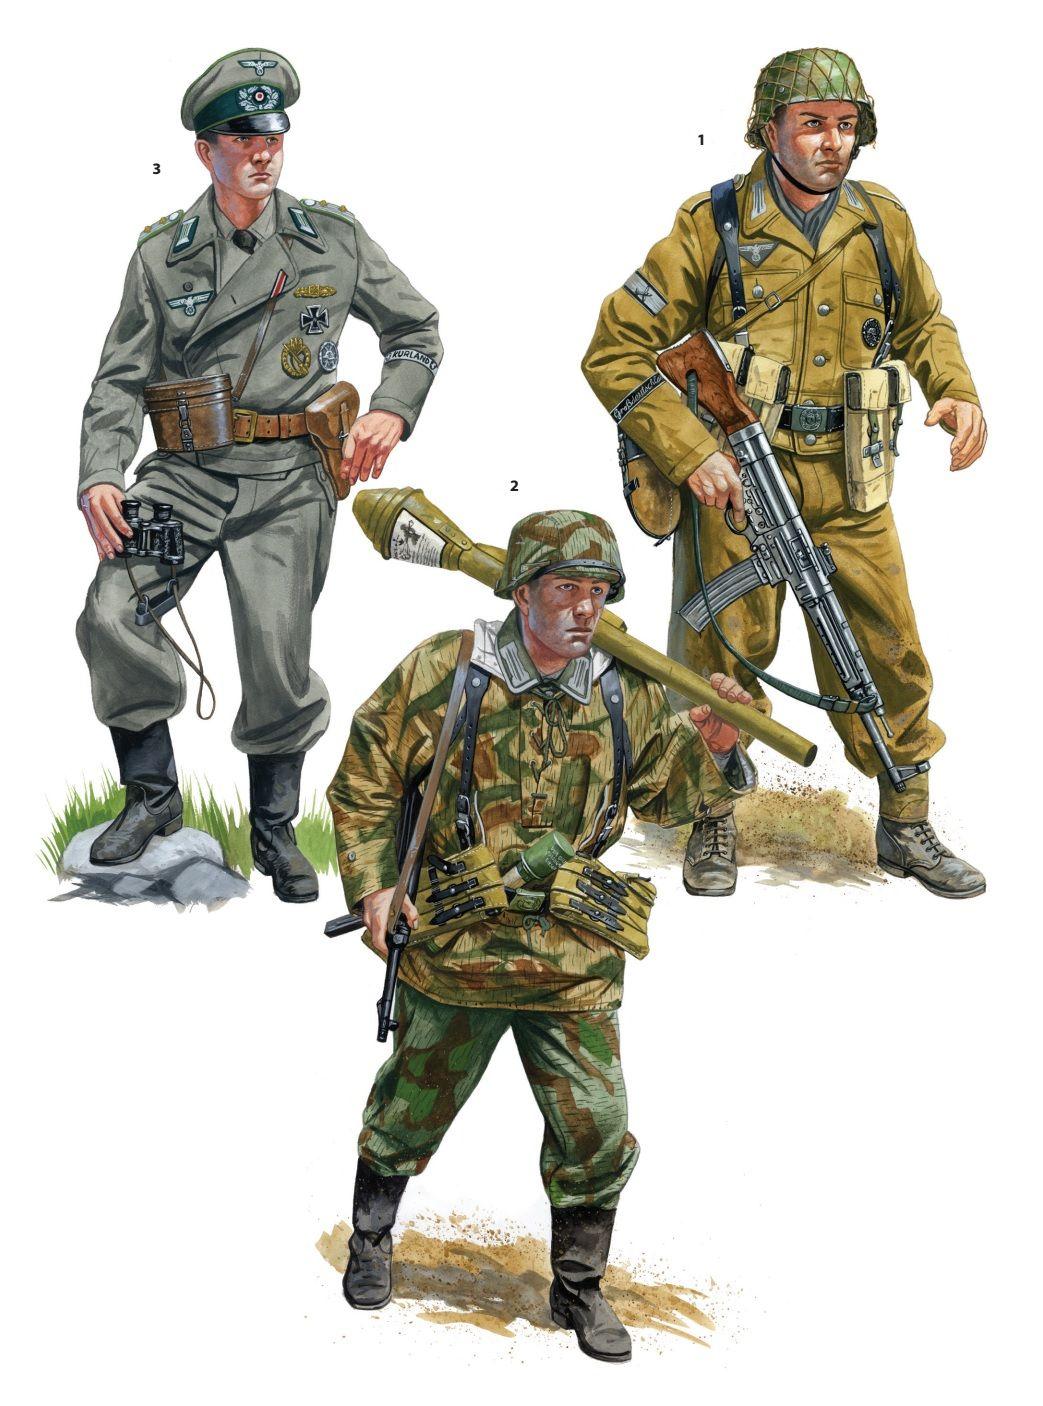 Day reenactment ww ii pictures pinterest - World War Ii German Motorized Infantry Panzergrenadiers